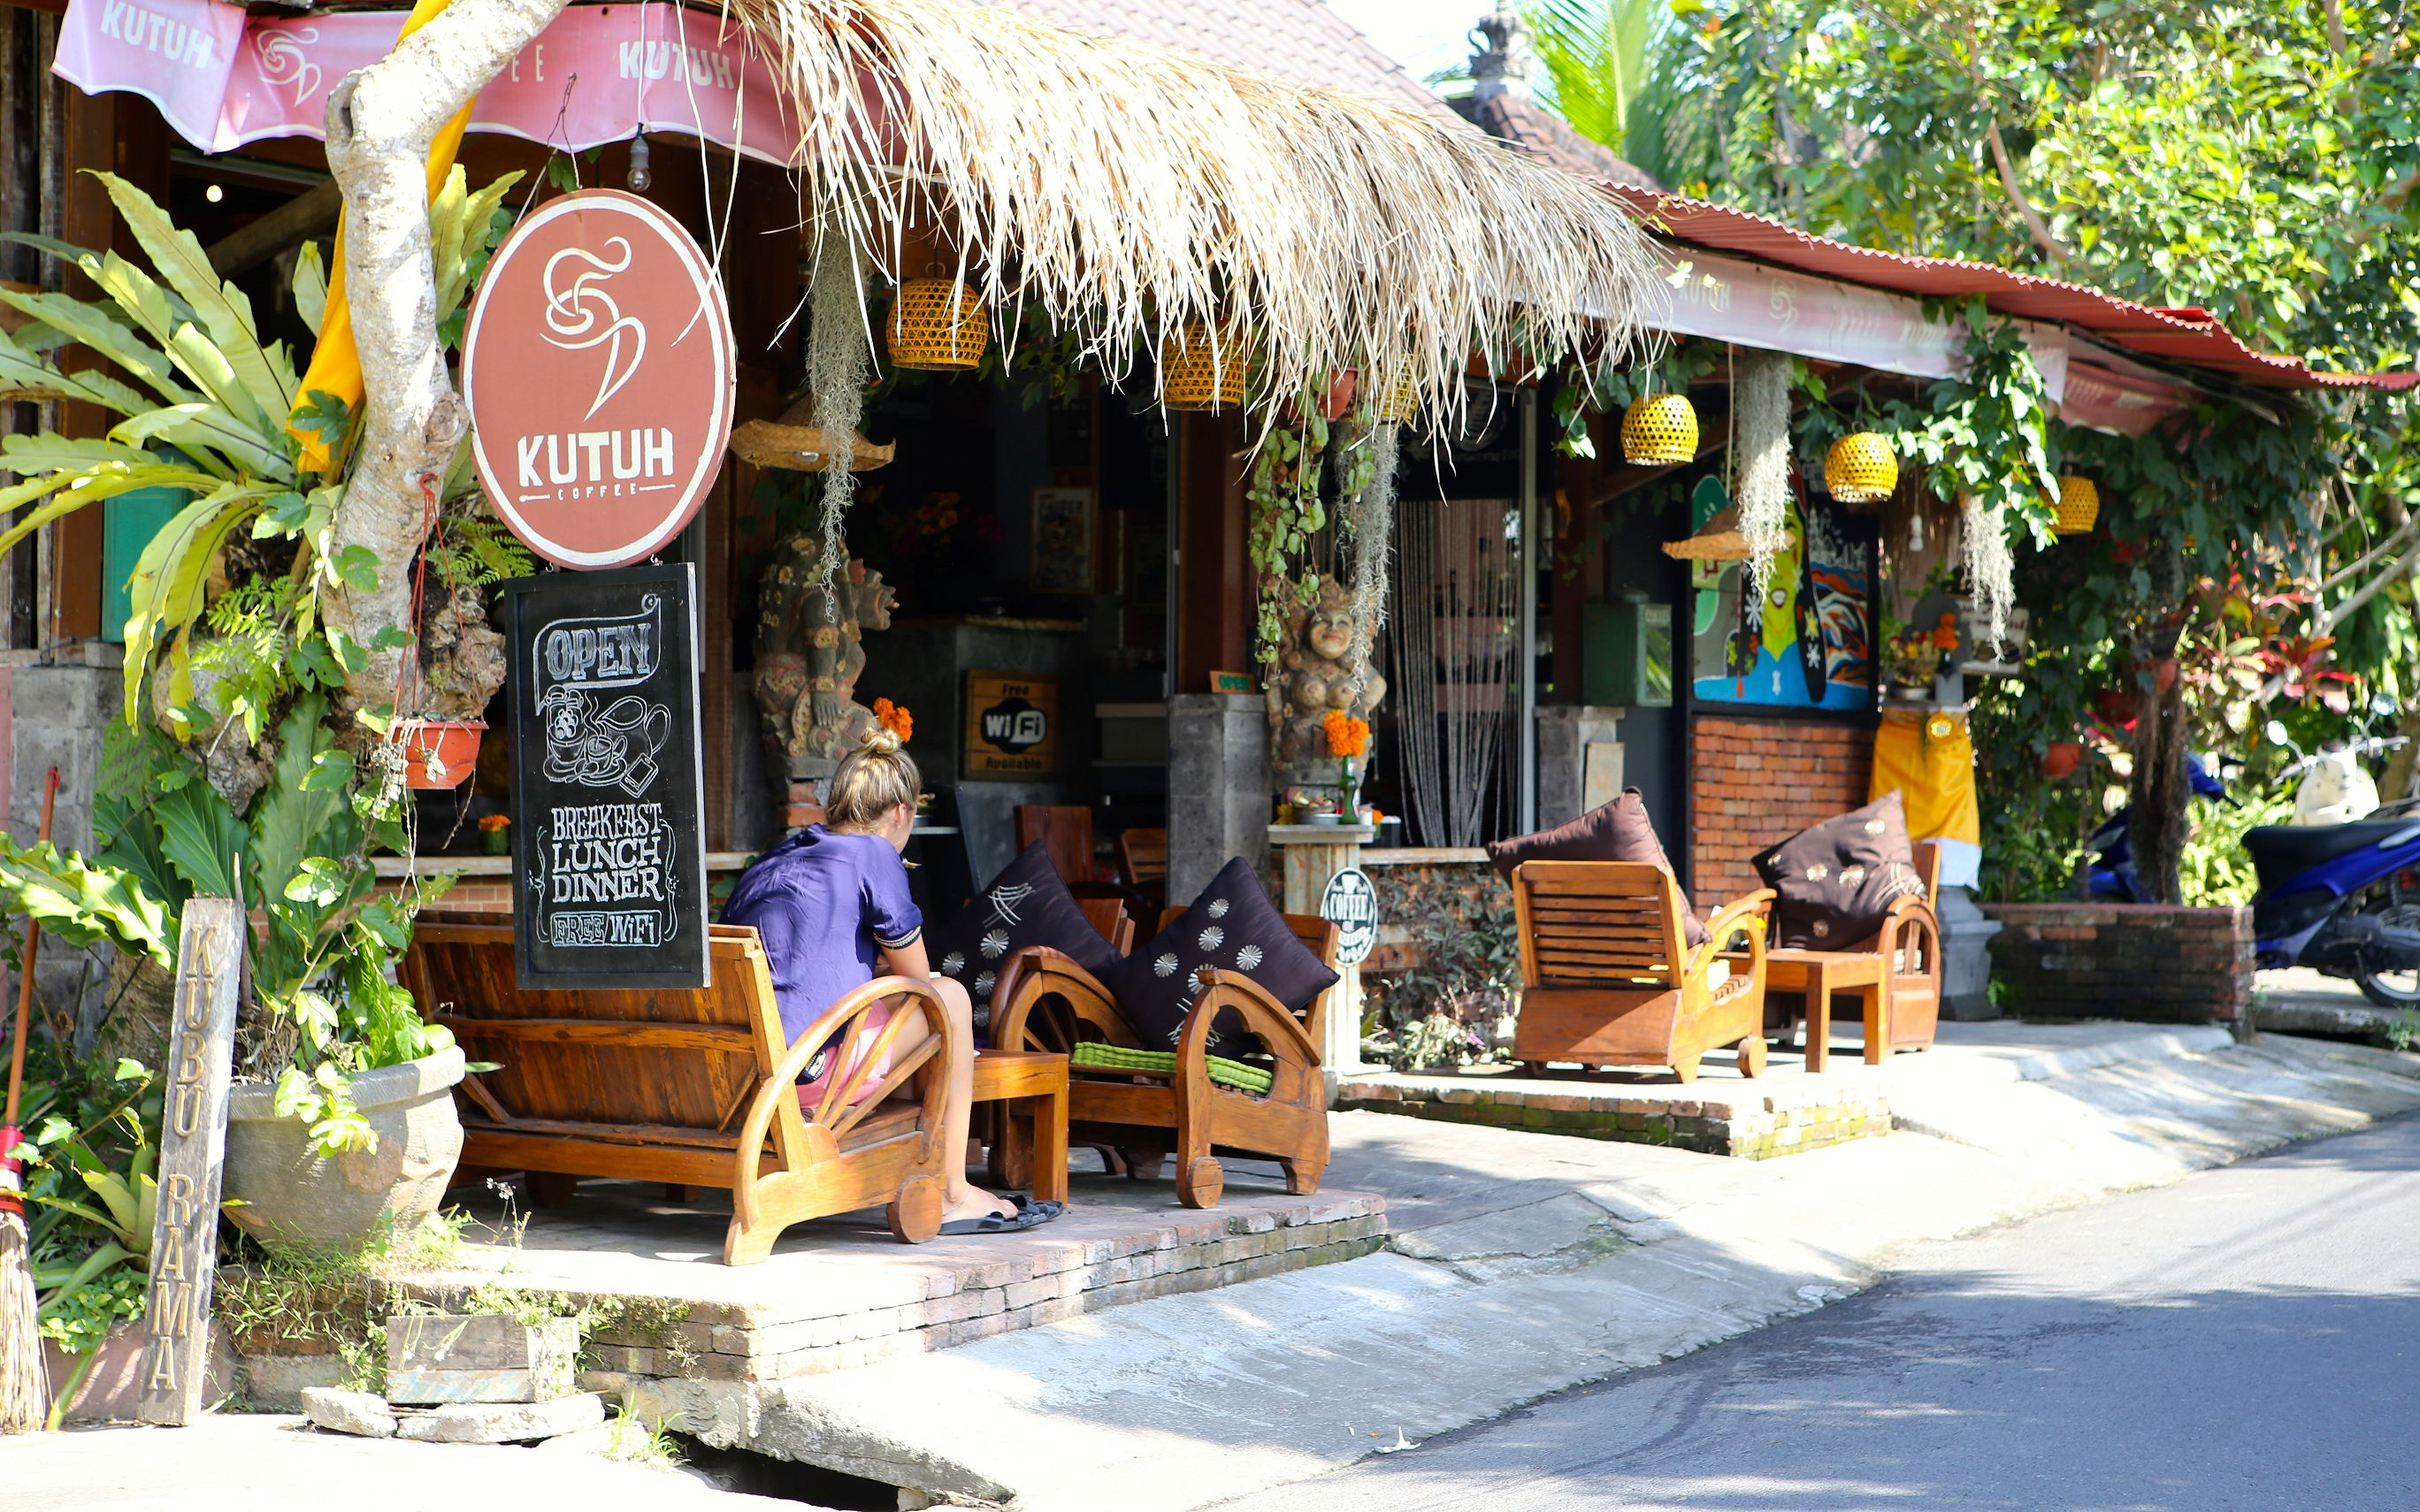 A nearby cafe